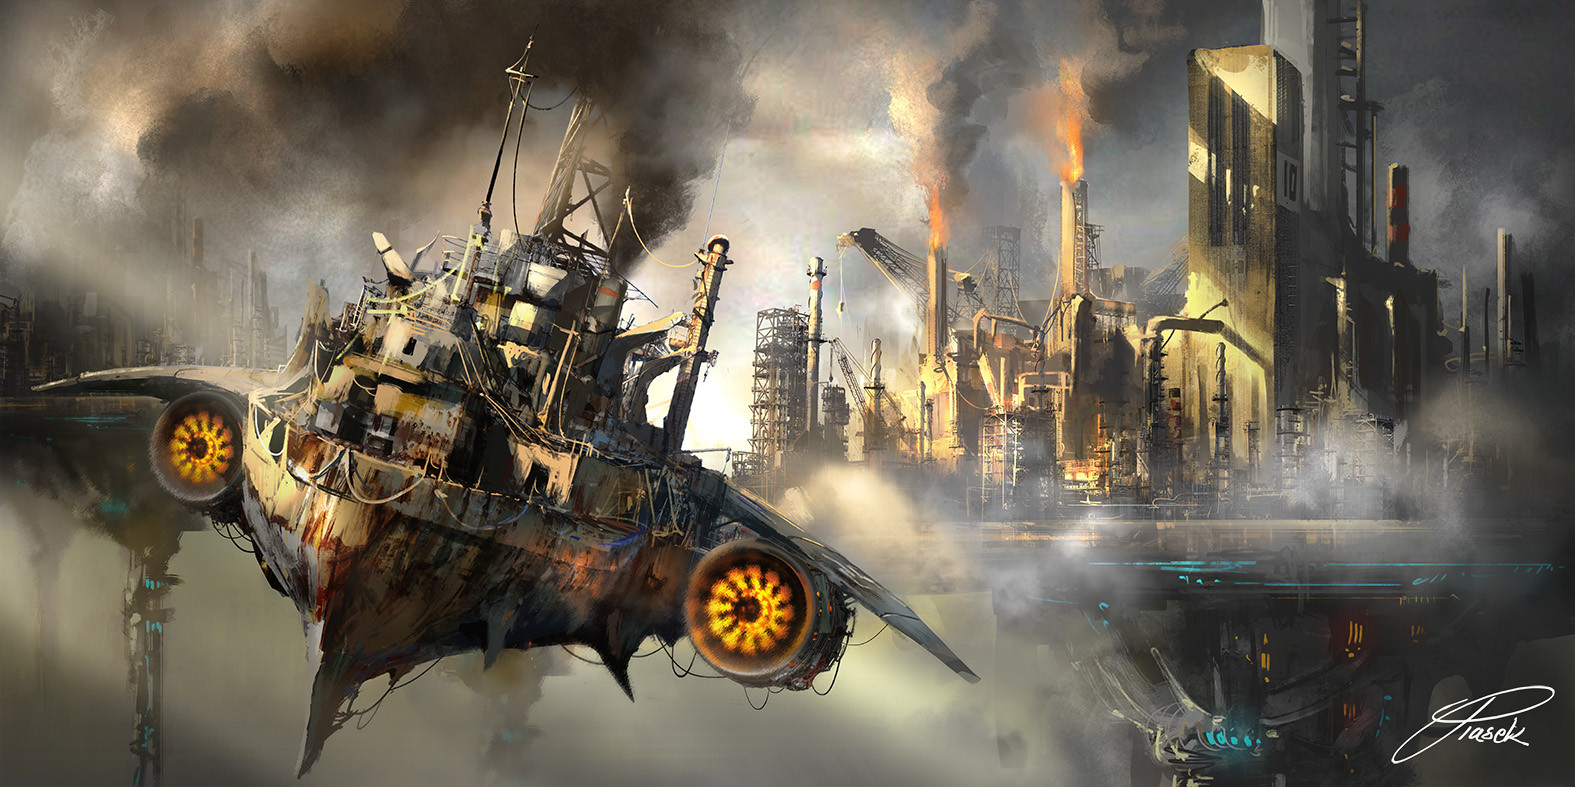 flying ship by Krzysztof Piasek